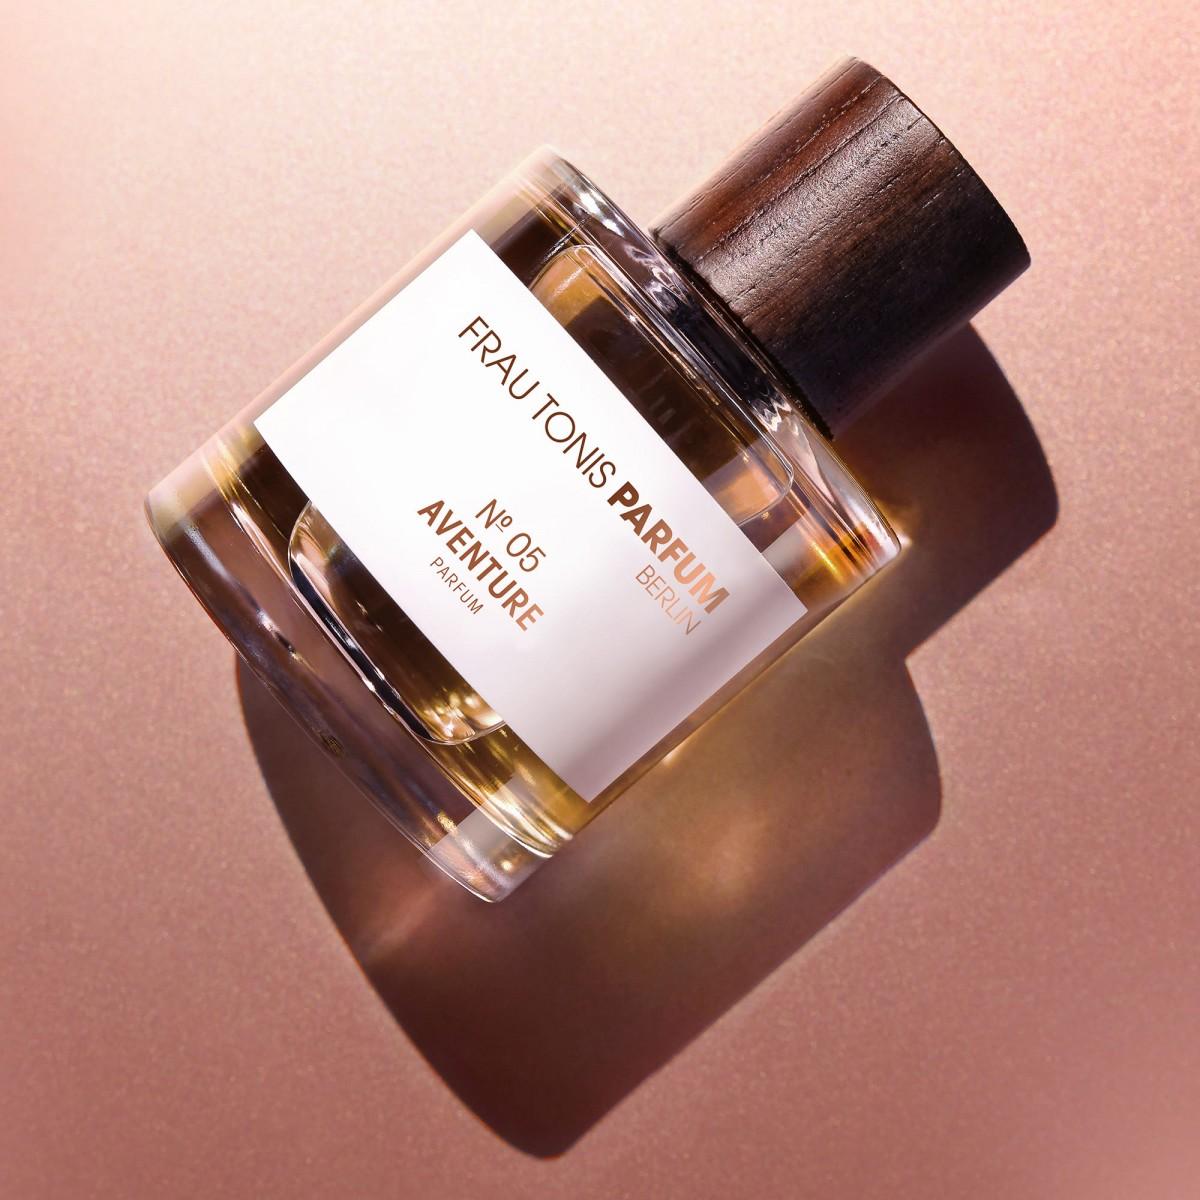 No. 05 Aventure   Parfum Intense (50ml) by Frau Tonis Parfum